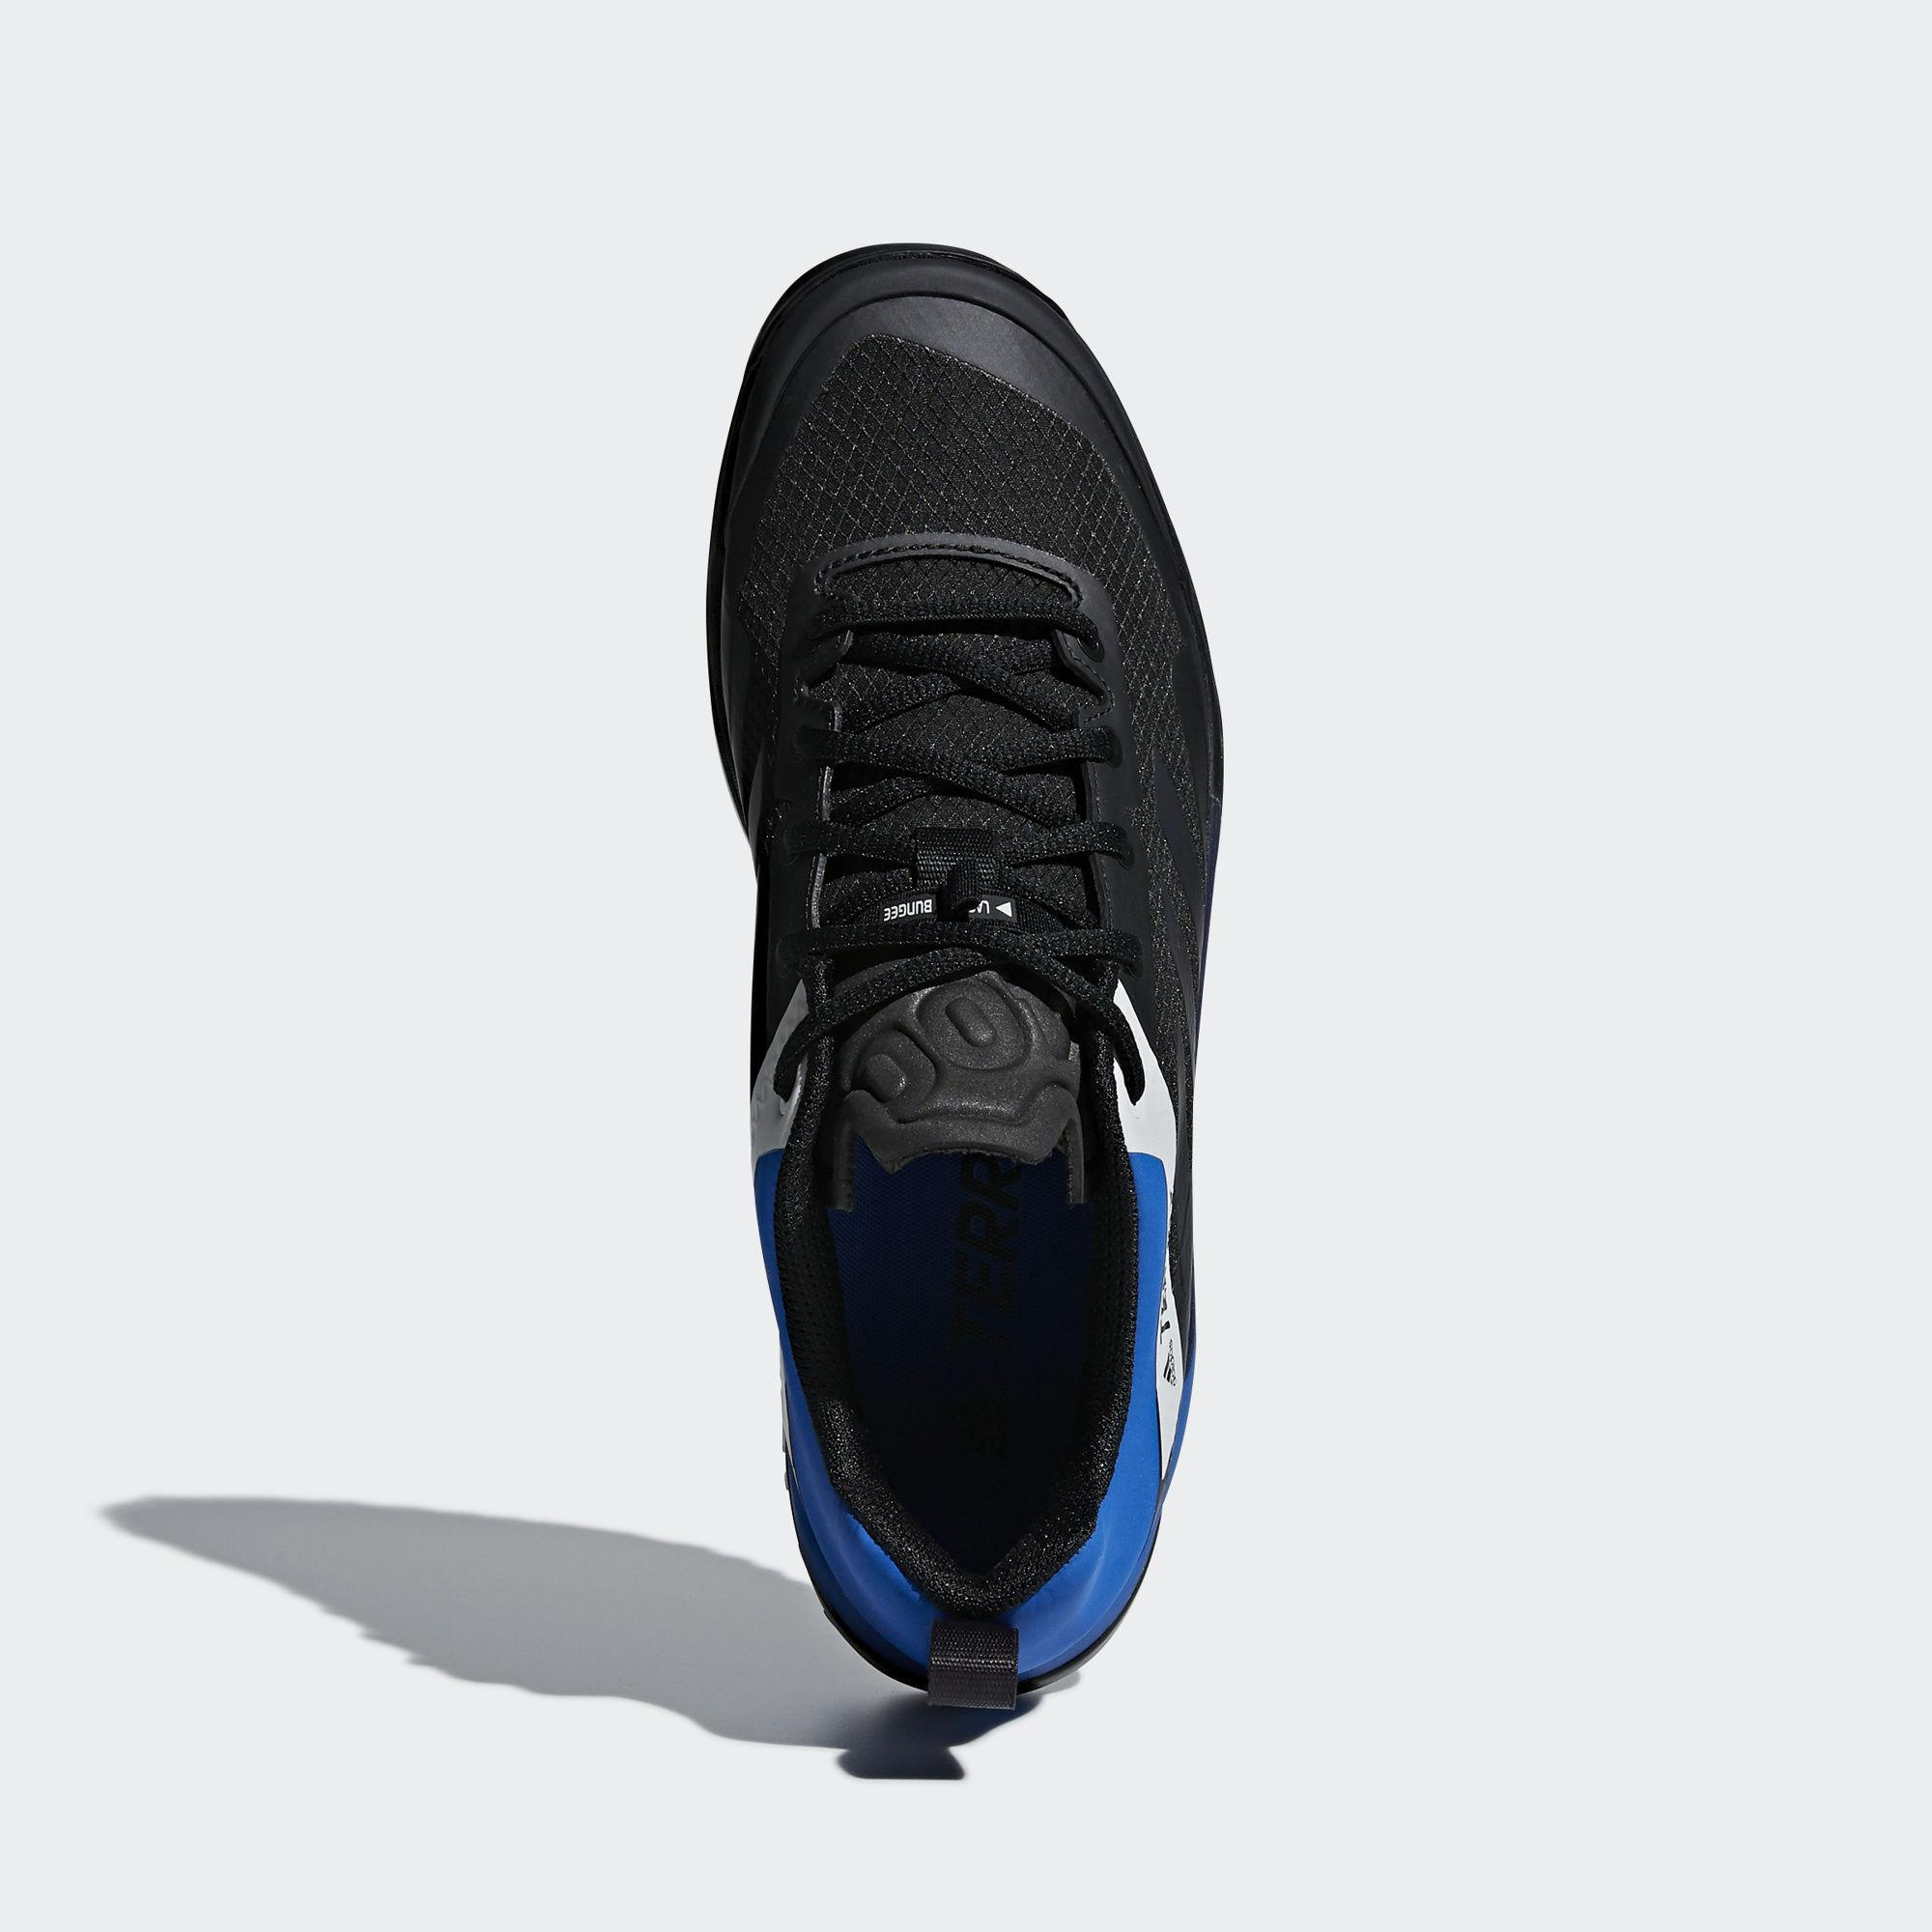 8074e40cd026 Adidas - Black Terrex Trail Cross Sl Shoes for Men - Lyst. View fullscreen